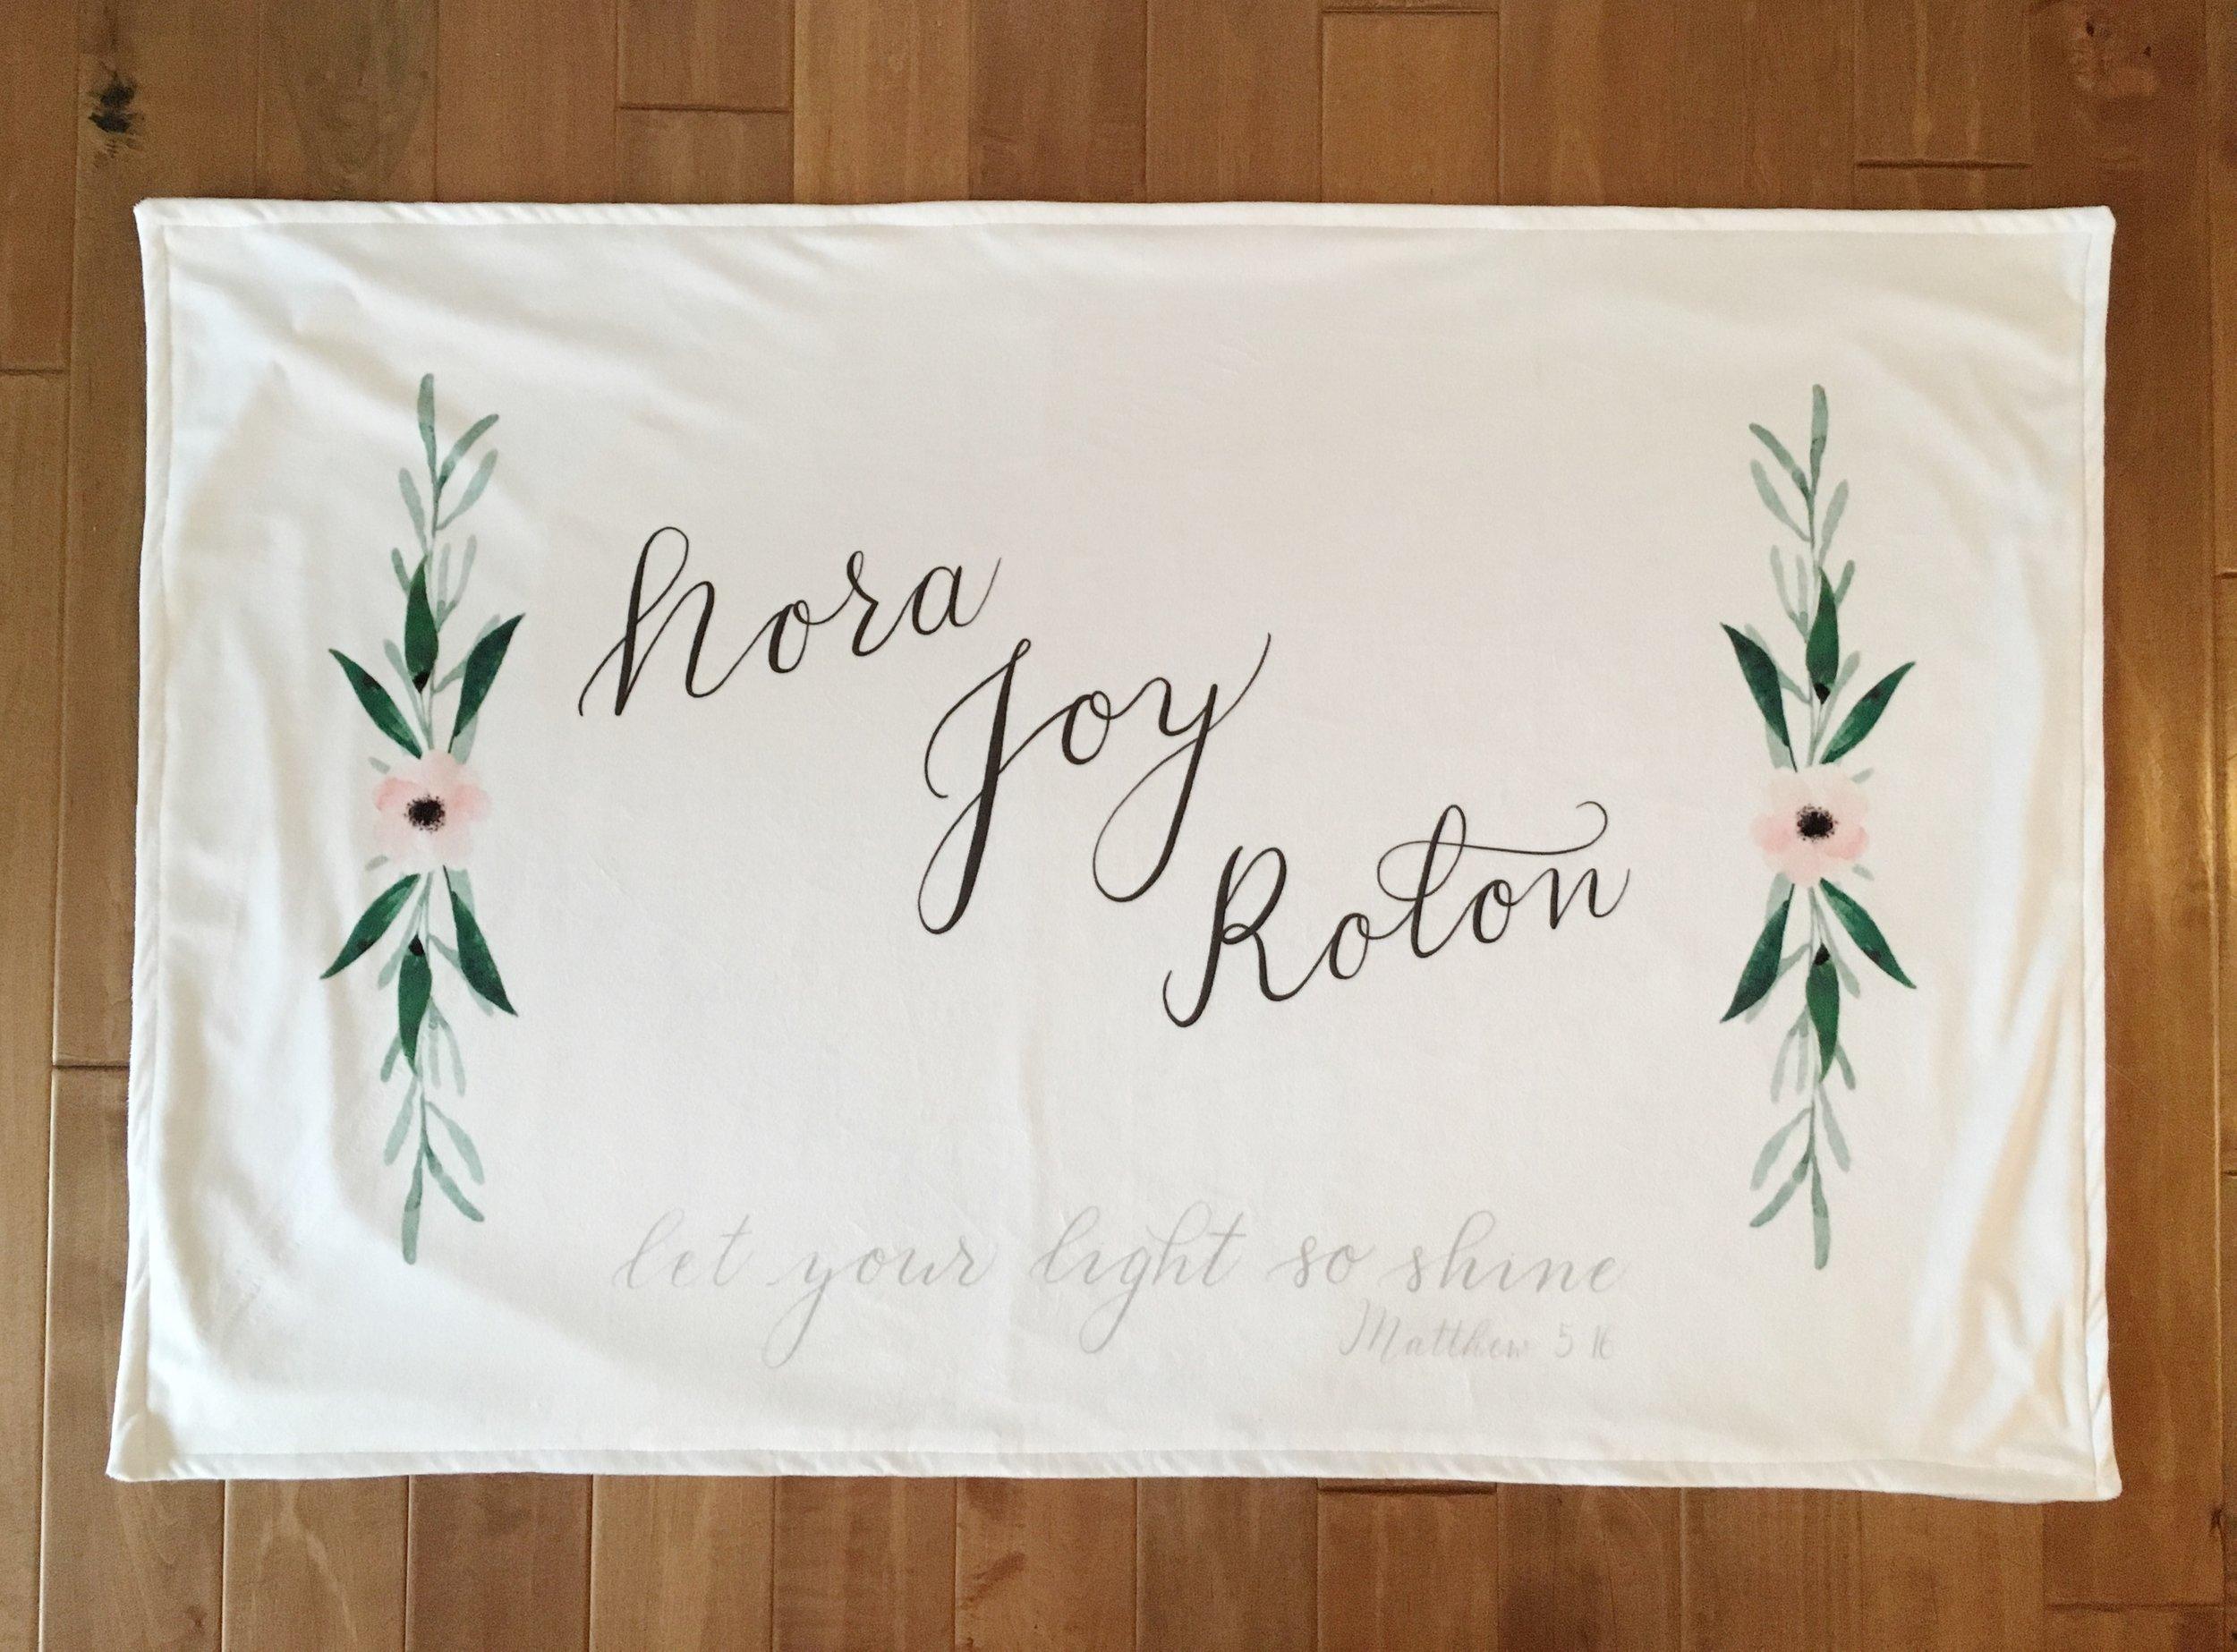 Central PA, Baby Blanket, Hand lettered, JesSmith Designs, Invitations, custom-04-03 17.11.42.jpg